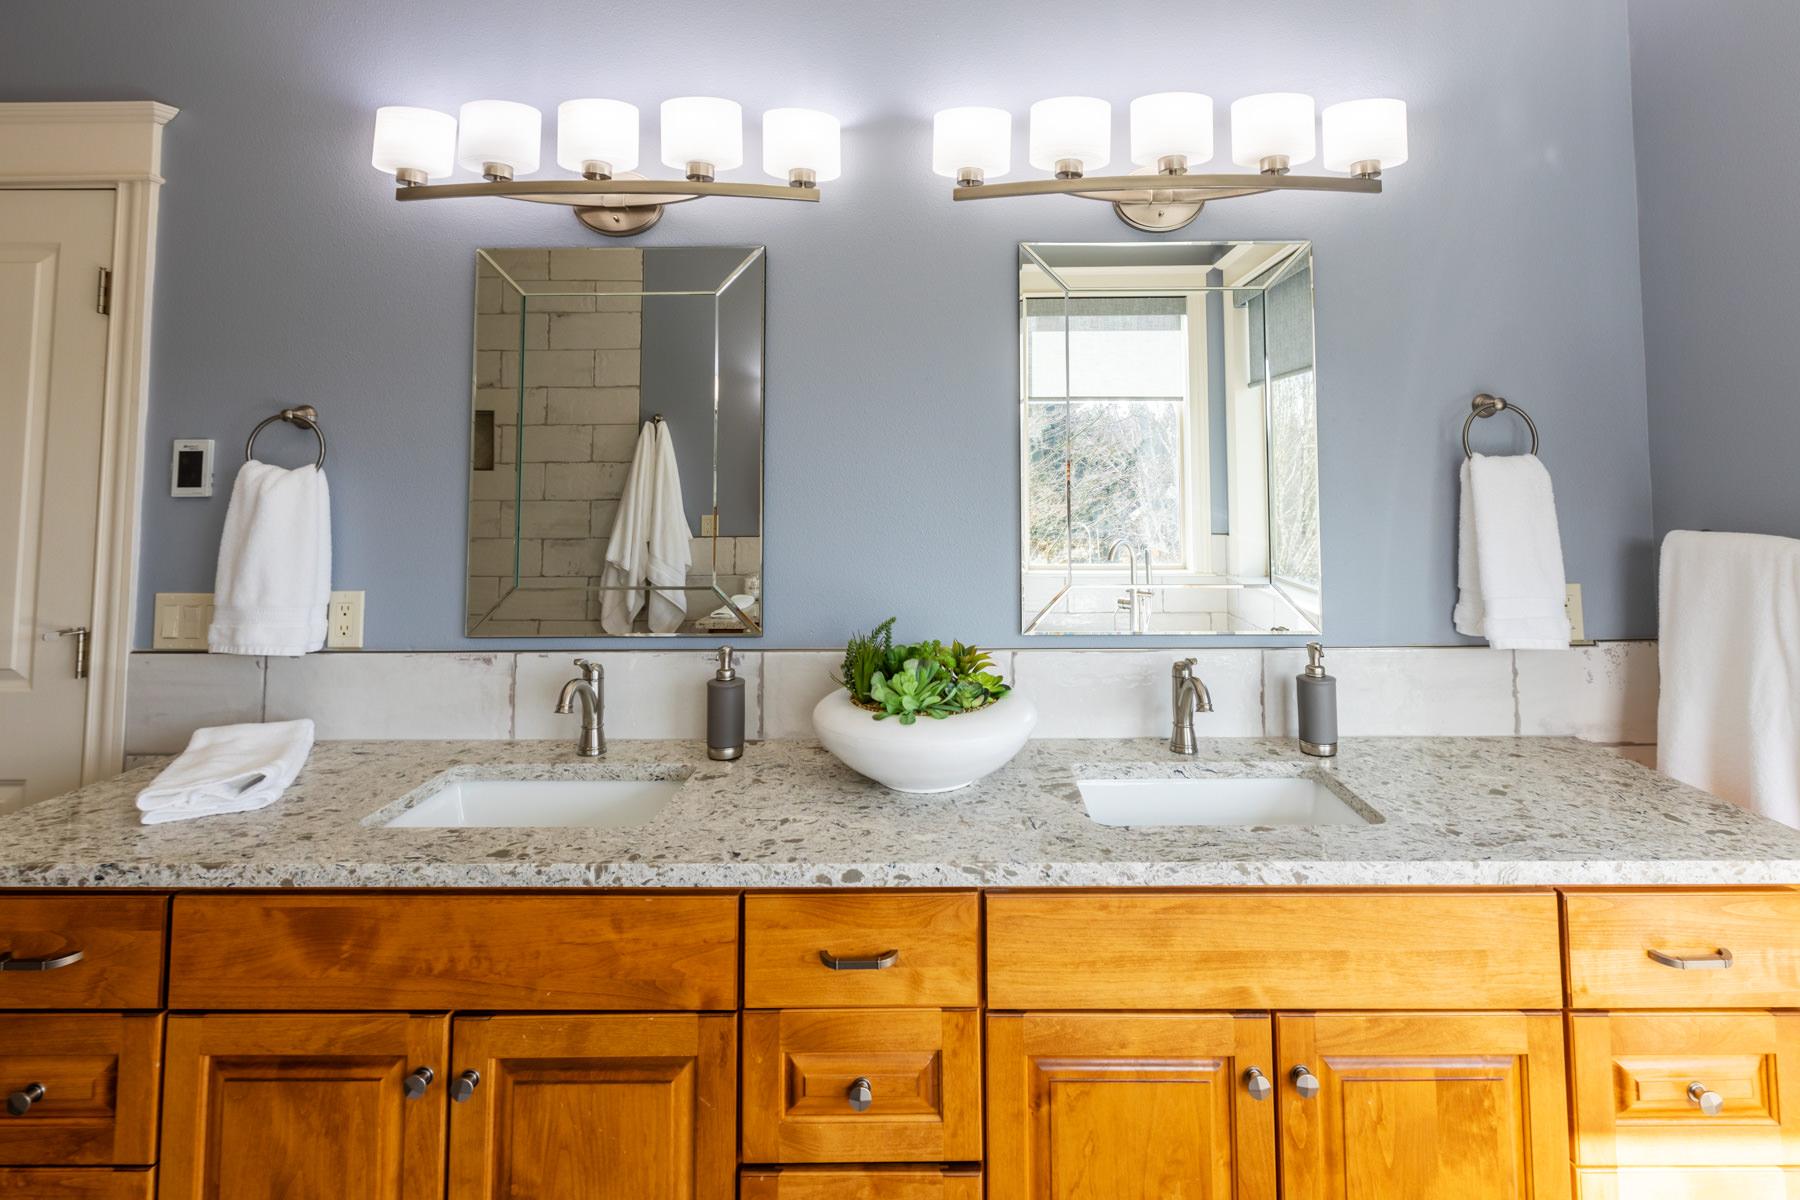 Croft House Bathroom Remodel